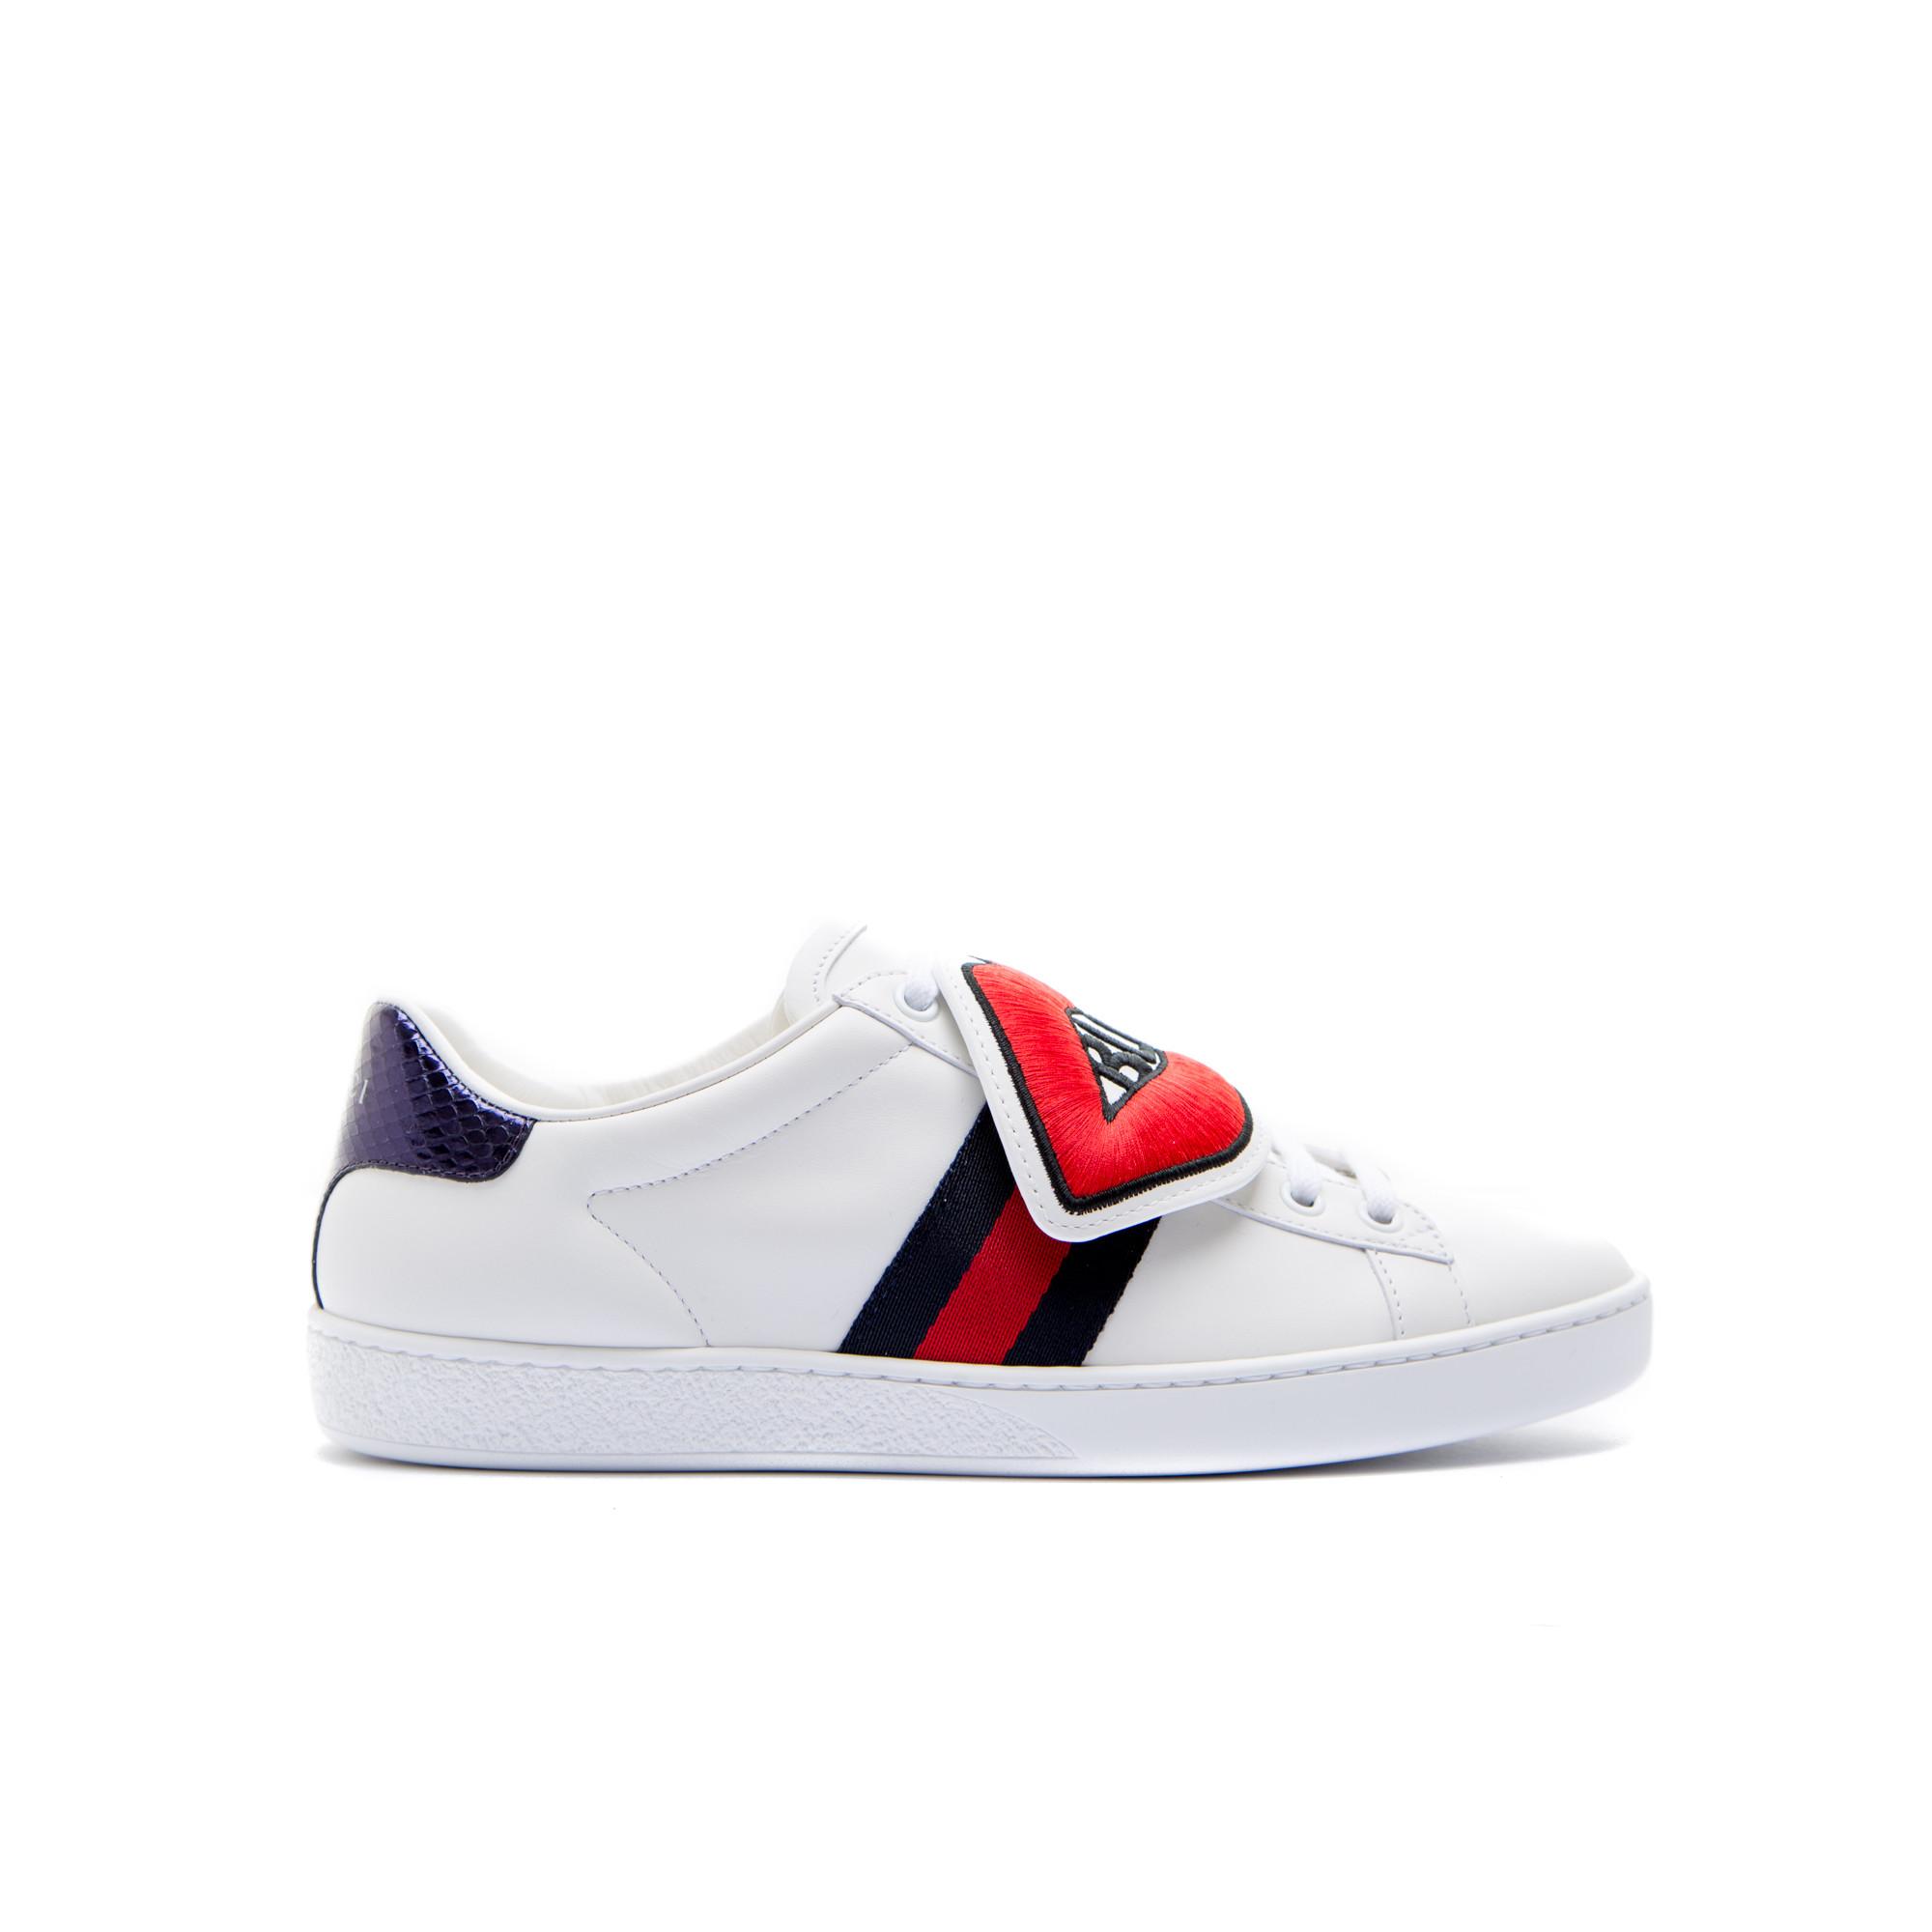 Gucci Sport Shoes Multi | Derodeloper.com